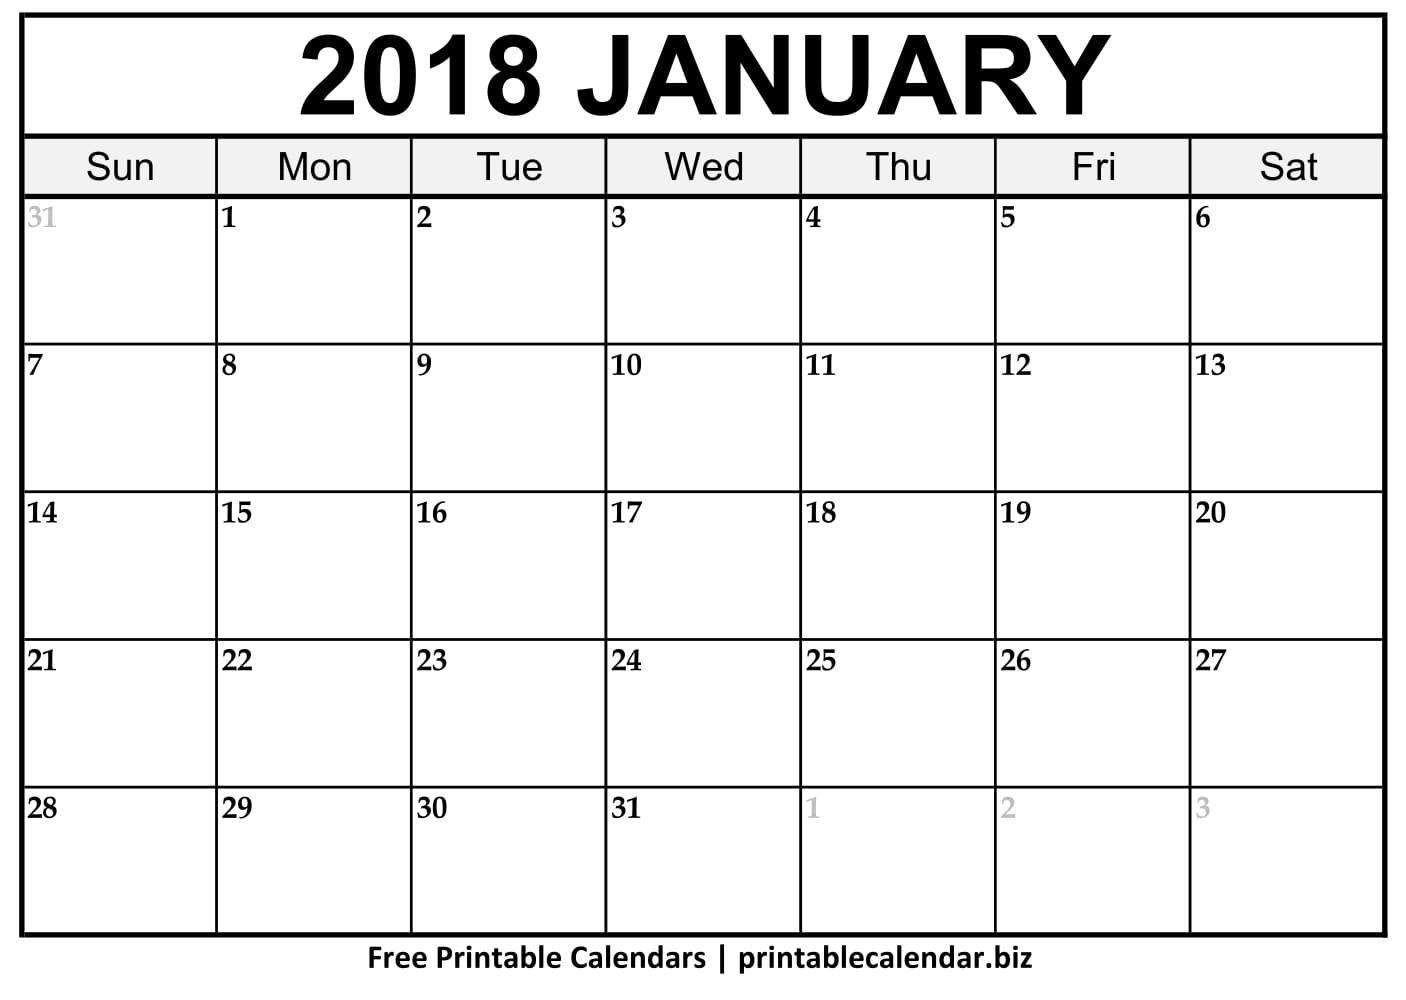 2019 Printable Calendar Templates - Printablecalendar.biz